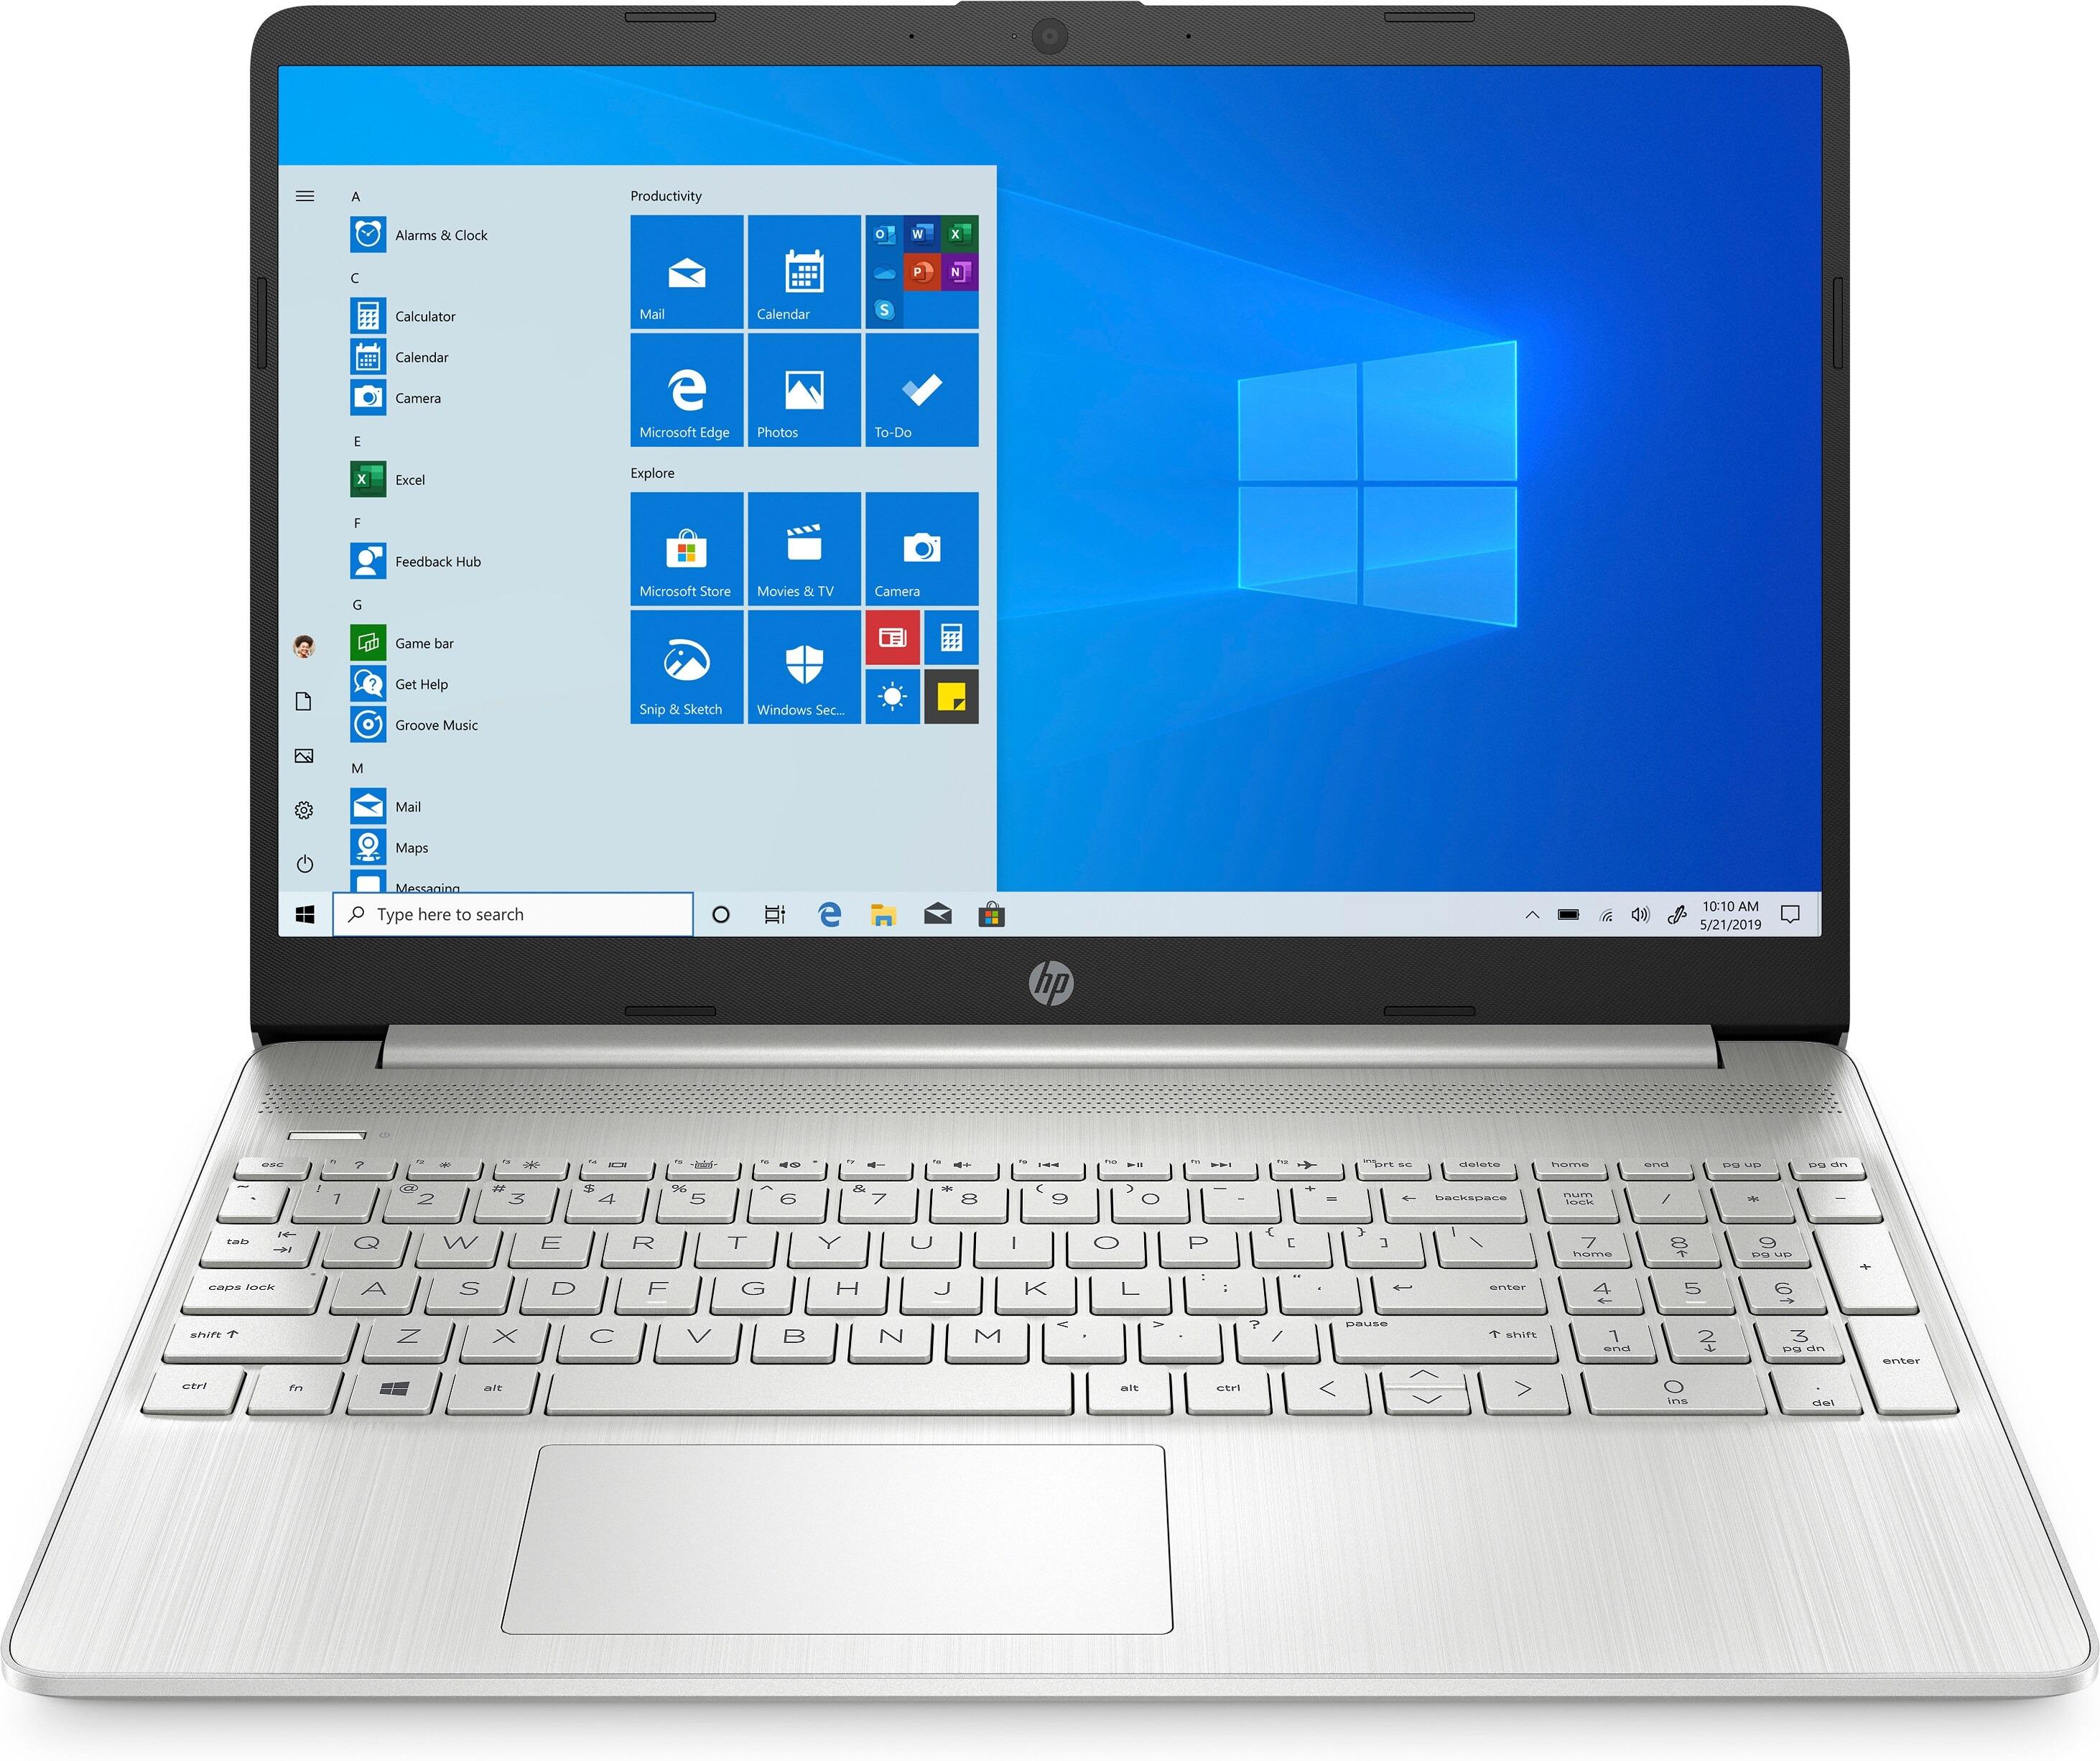 Korting HP 15s eq0022nd laptop